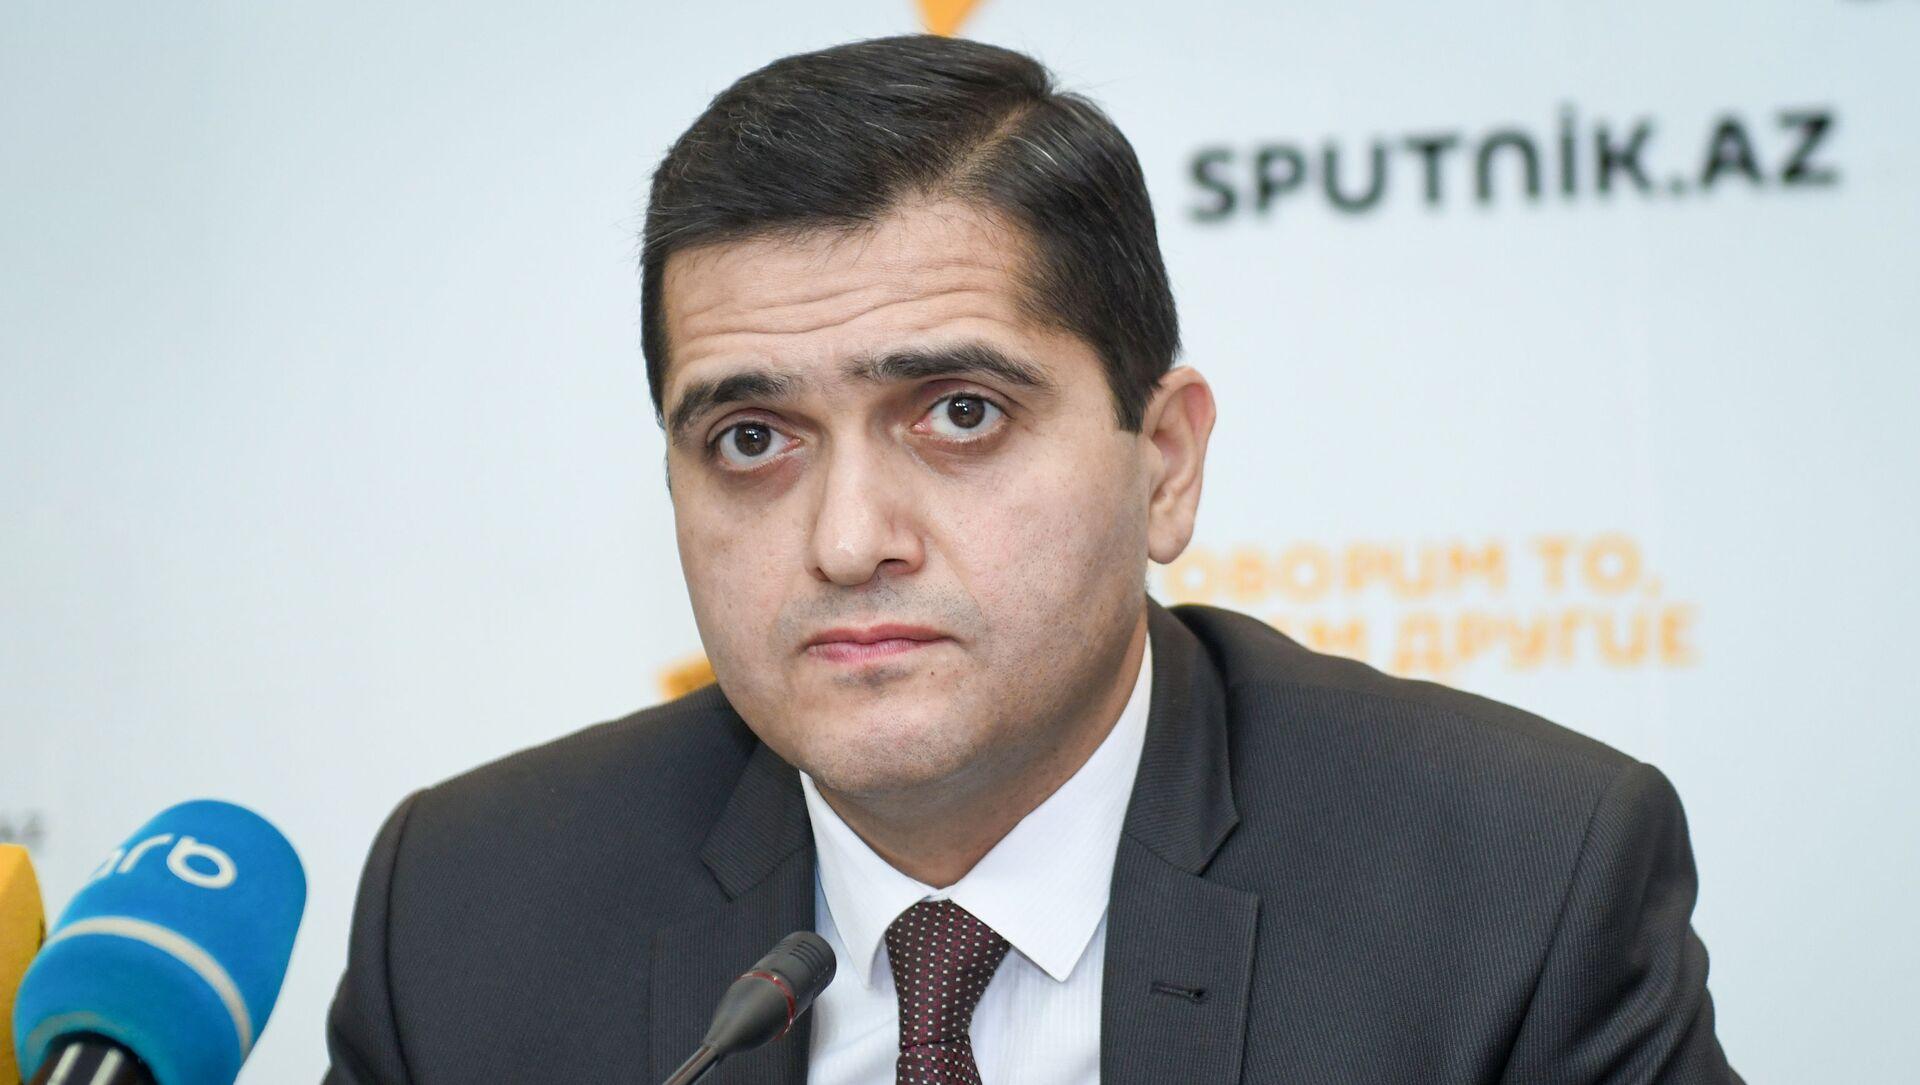 Руководитель аналитического агентства Атлас Эльхан Шахиноглу  - Sputnik Азербайджан, 1920, 21.09.2021